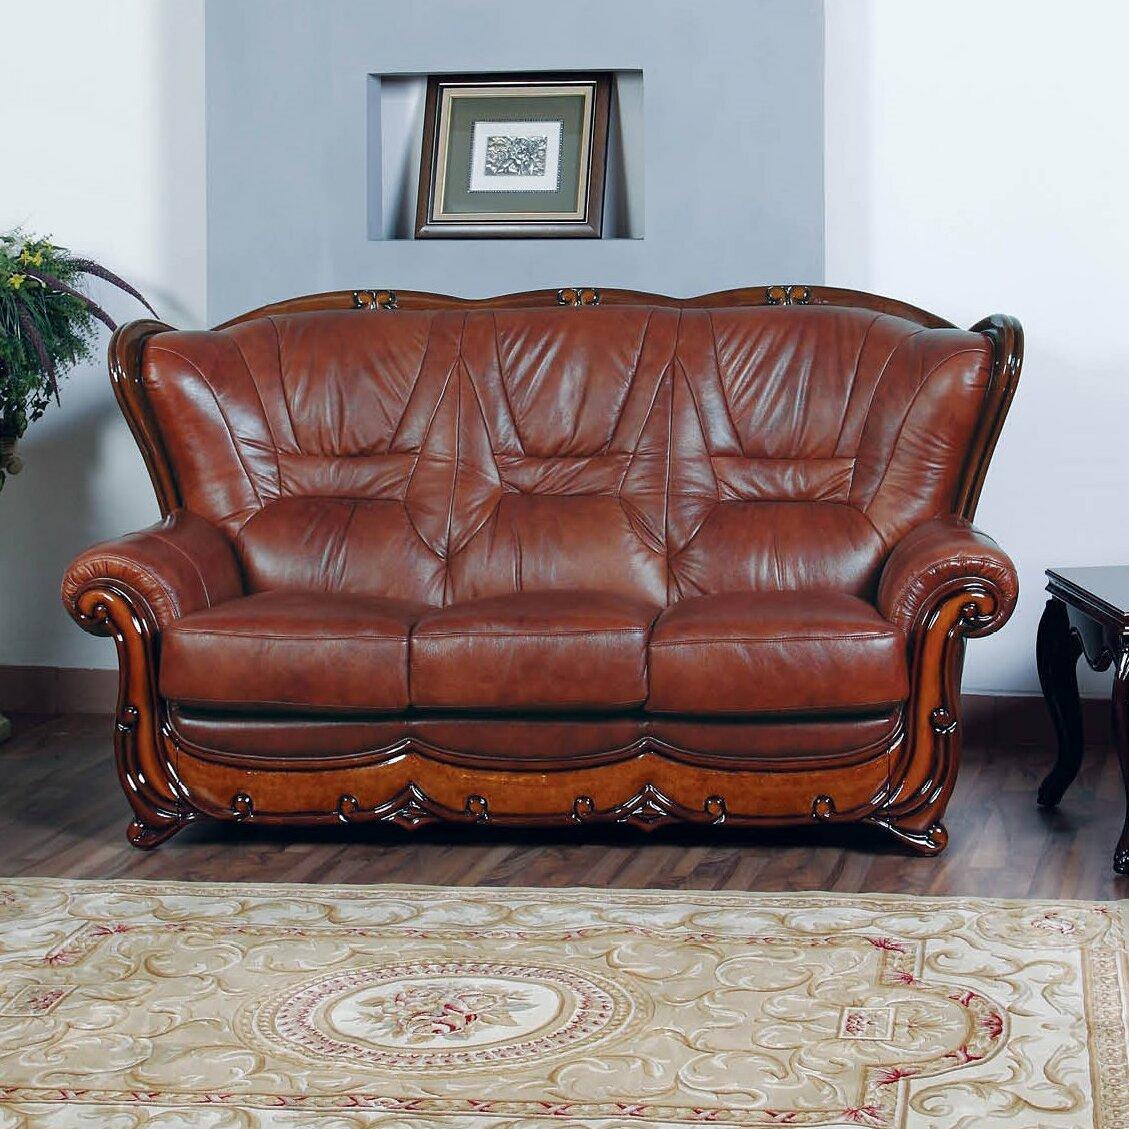 Nocidesign Wood Trim Sofa Wayfair